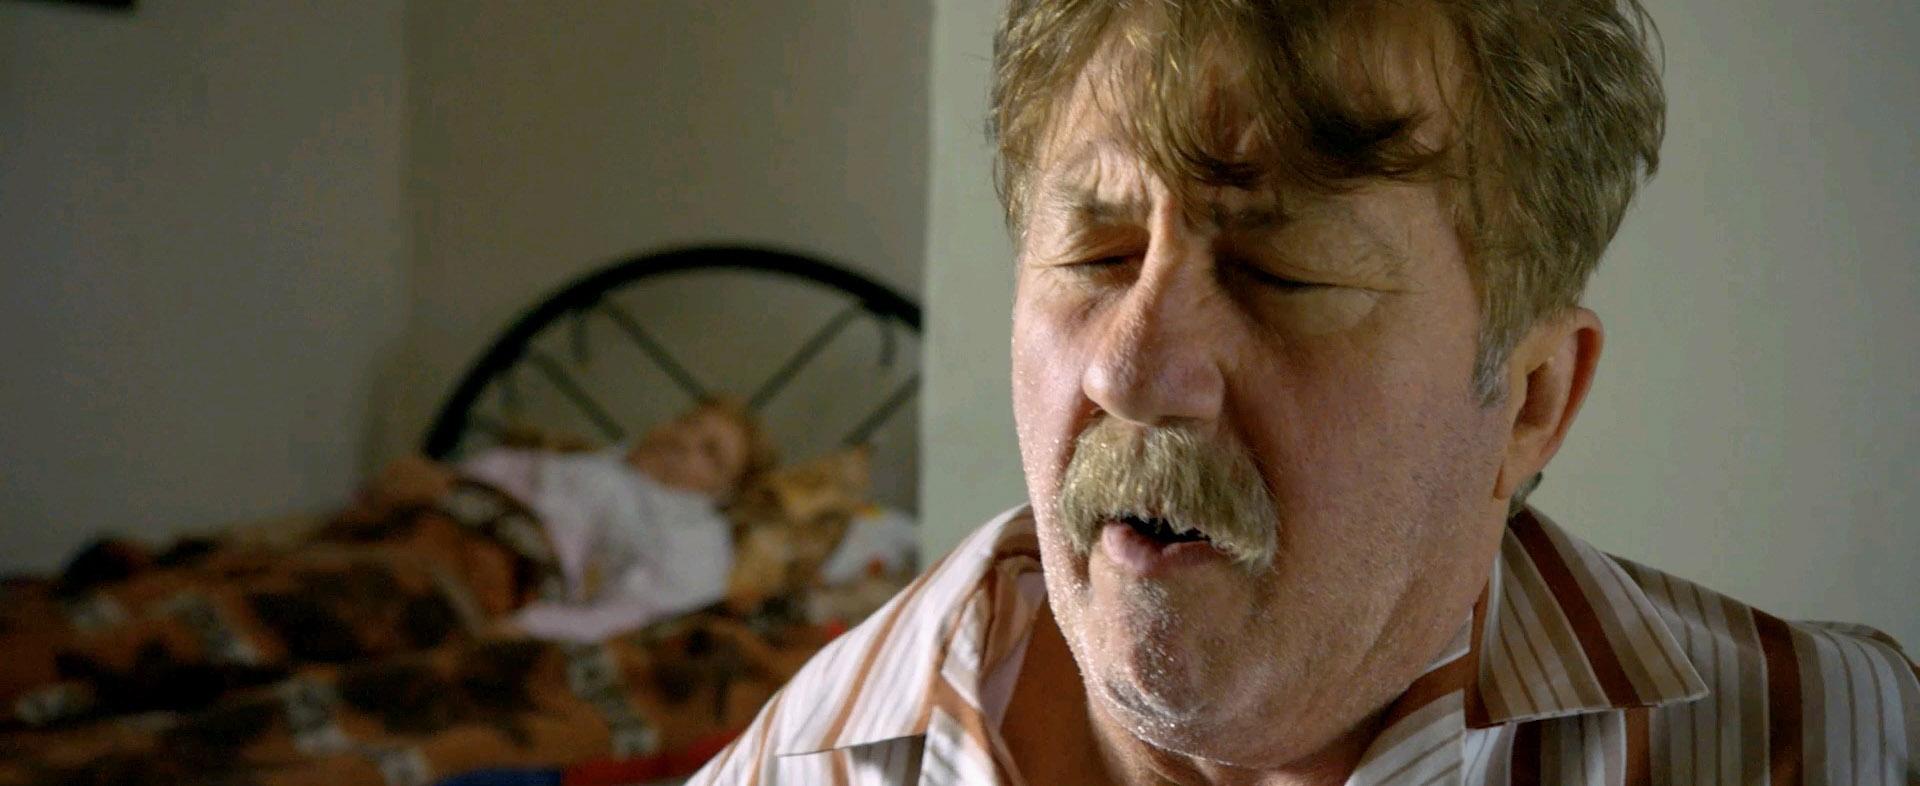 Gerçek Kesit: Manyak | 2018 | Yerli Film | WEB-DL | XviD | Sansürsüz | 1080p - m720p - m1080p | WEB-DL | Tek Link